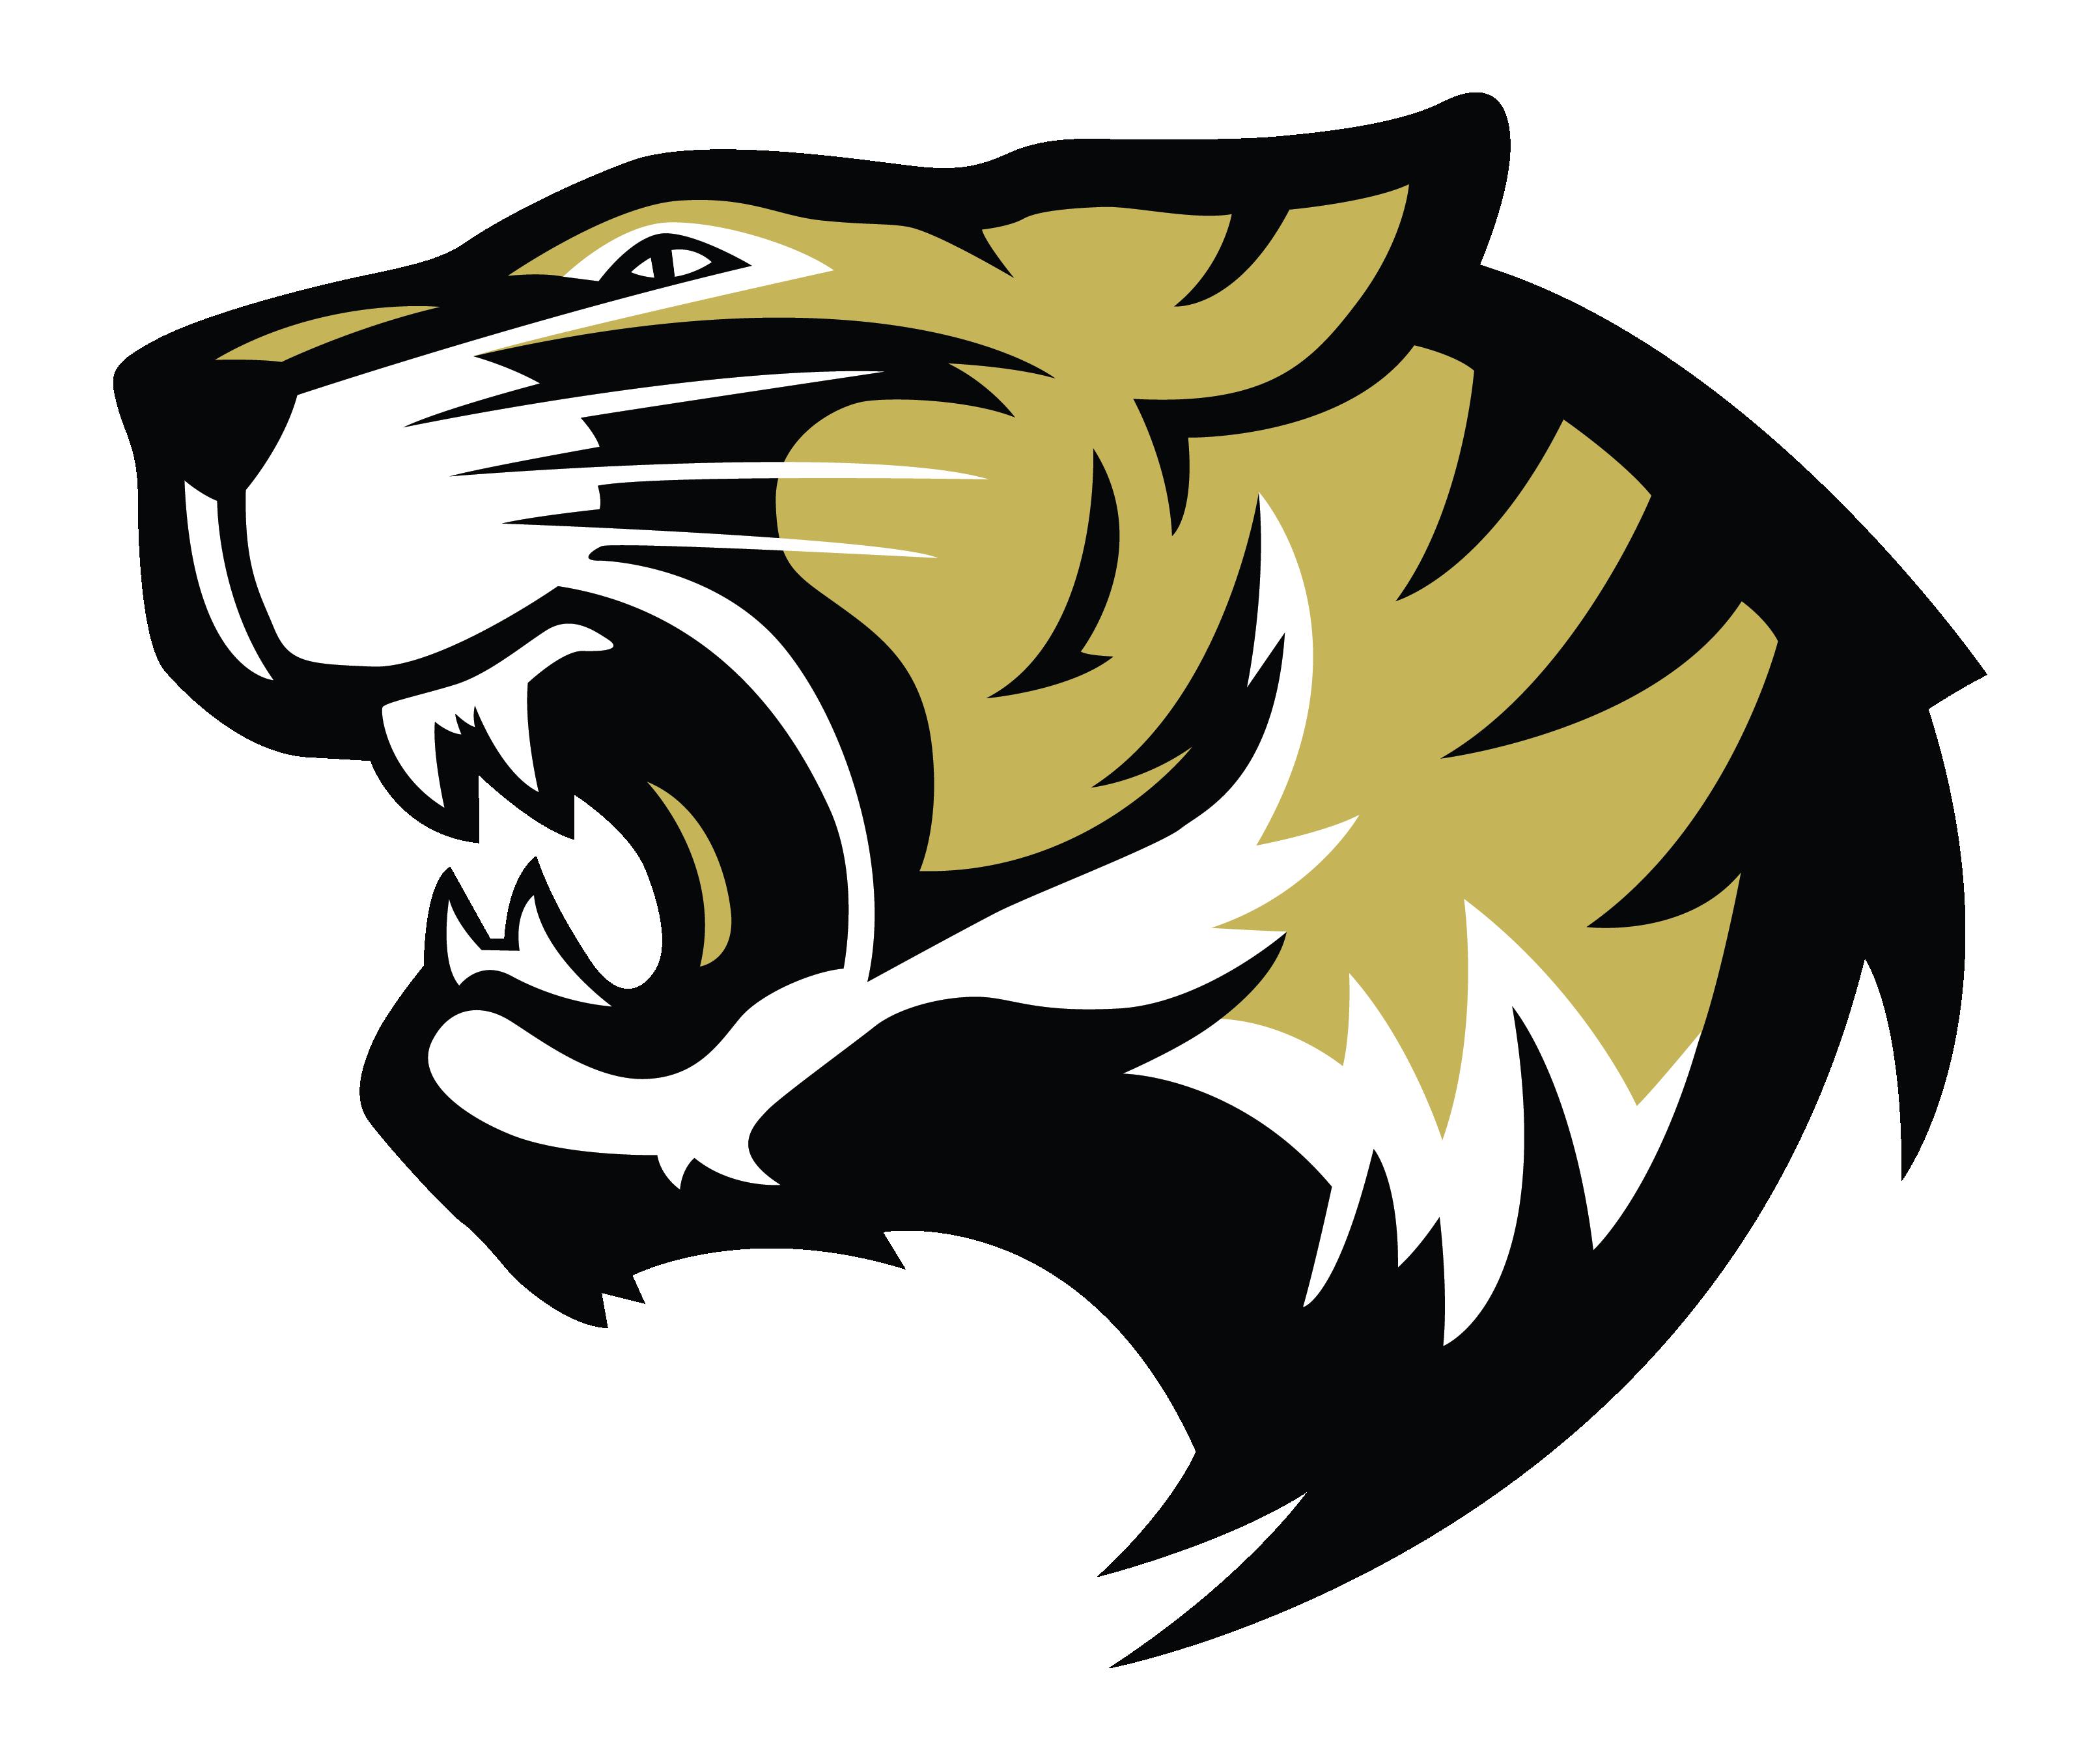 Communications / High School Logos.